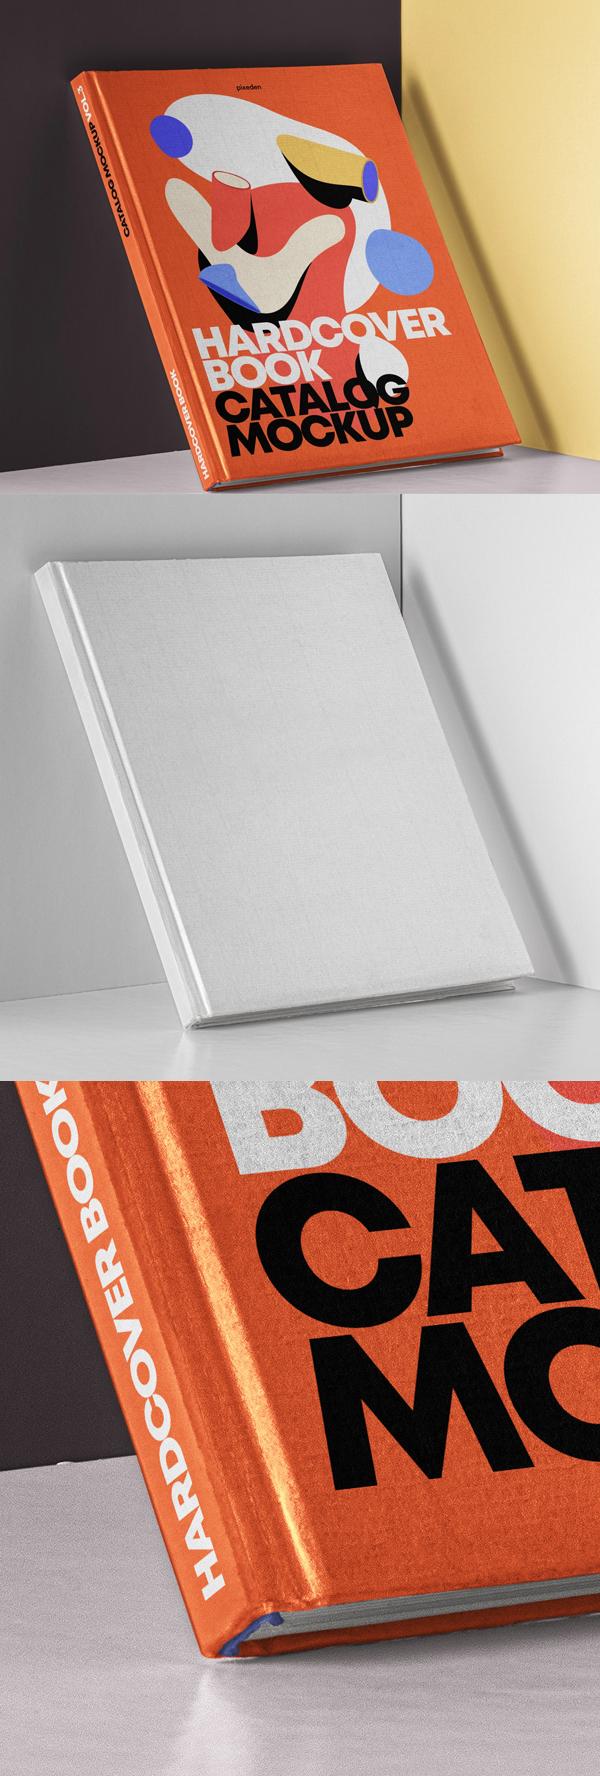 Free Psd Hardcover Book Catalog Mockup